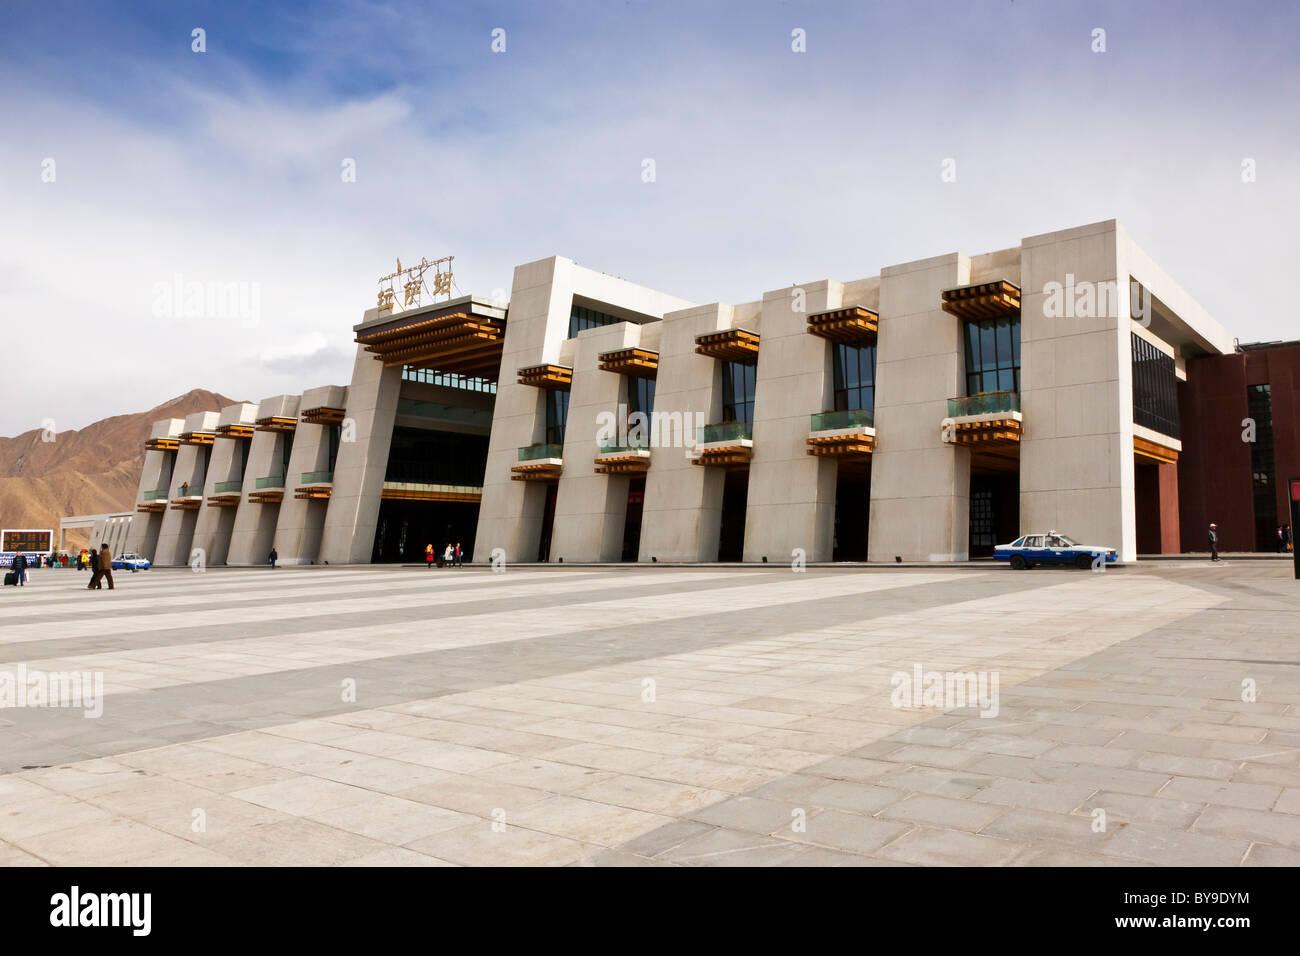 Exterior of the railway station Lhasa Tibet. JMH4612 - Stock Image